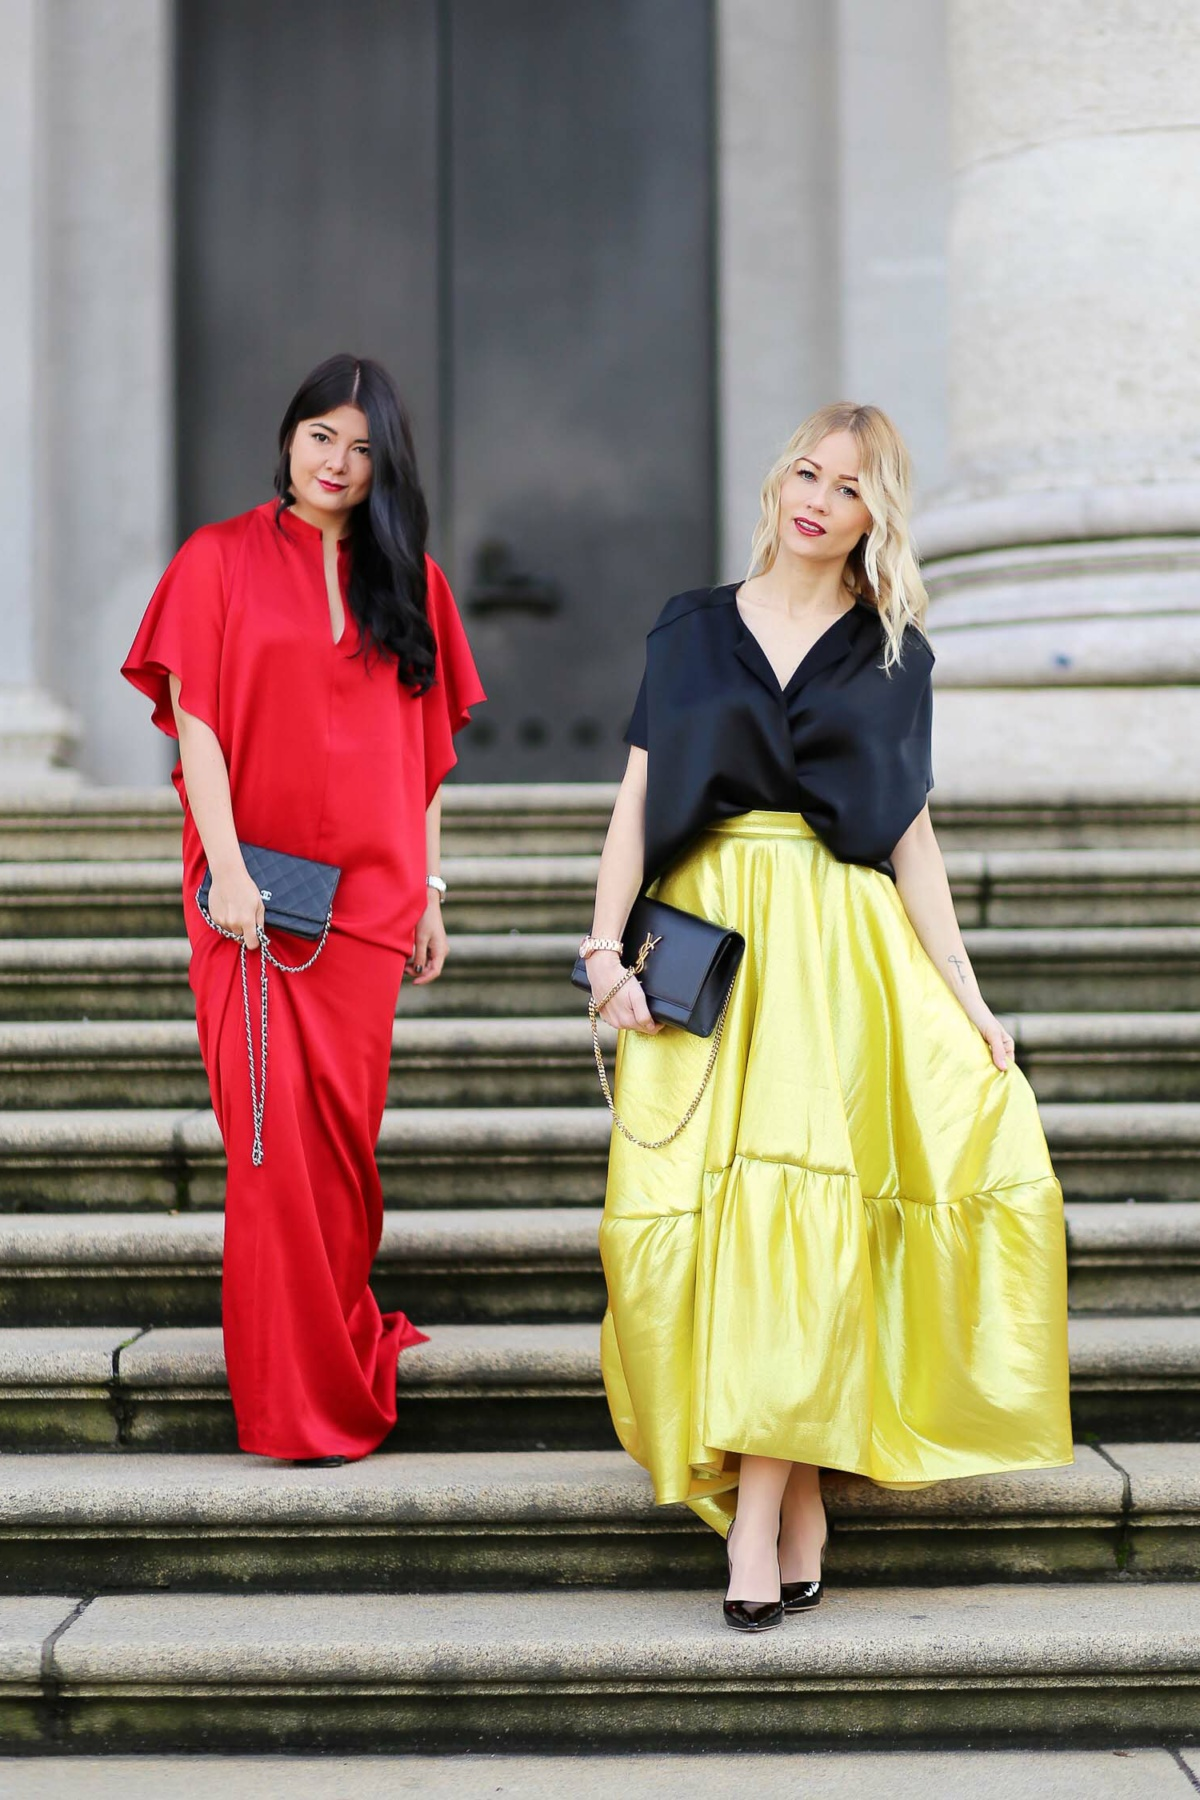 stylingliebe-fashionblog-muenchen-styleblog-munich-blogger-deutschland-fashionblogger-bloggerdeutschland-lifestyleblog-modeblog-germanblogger-bambi-verleihung-2016-2